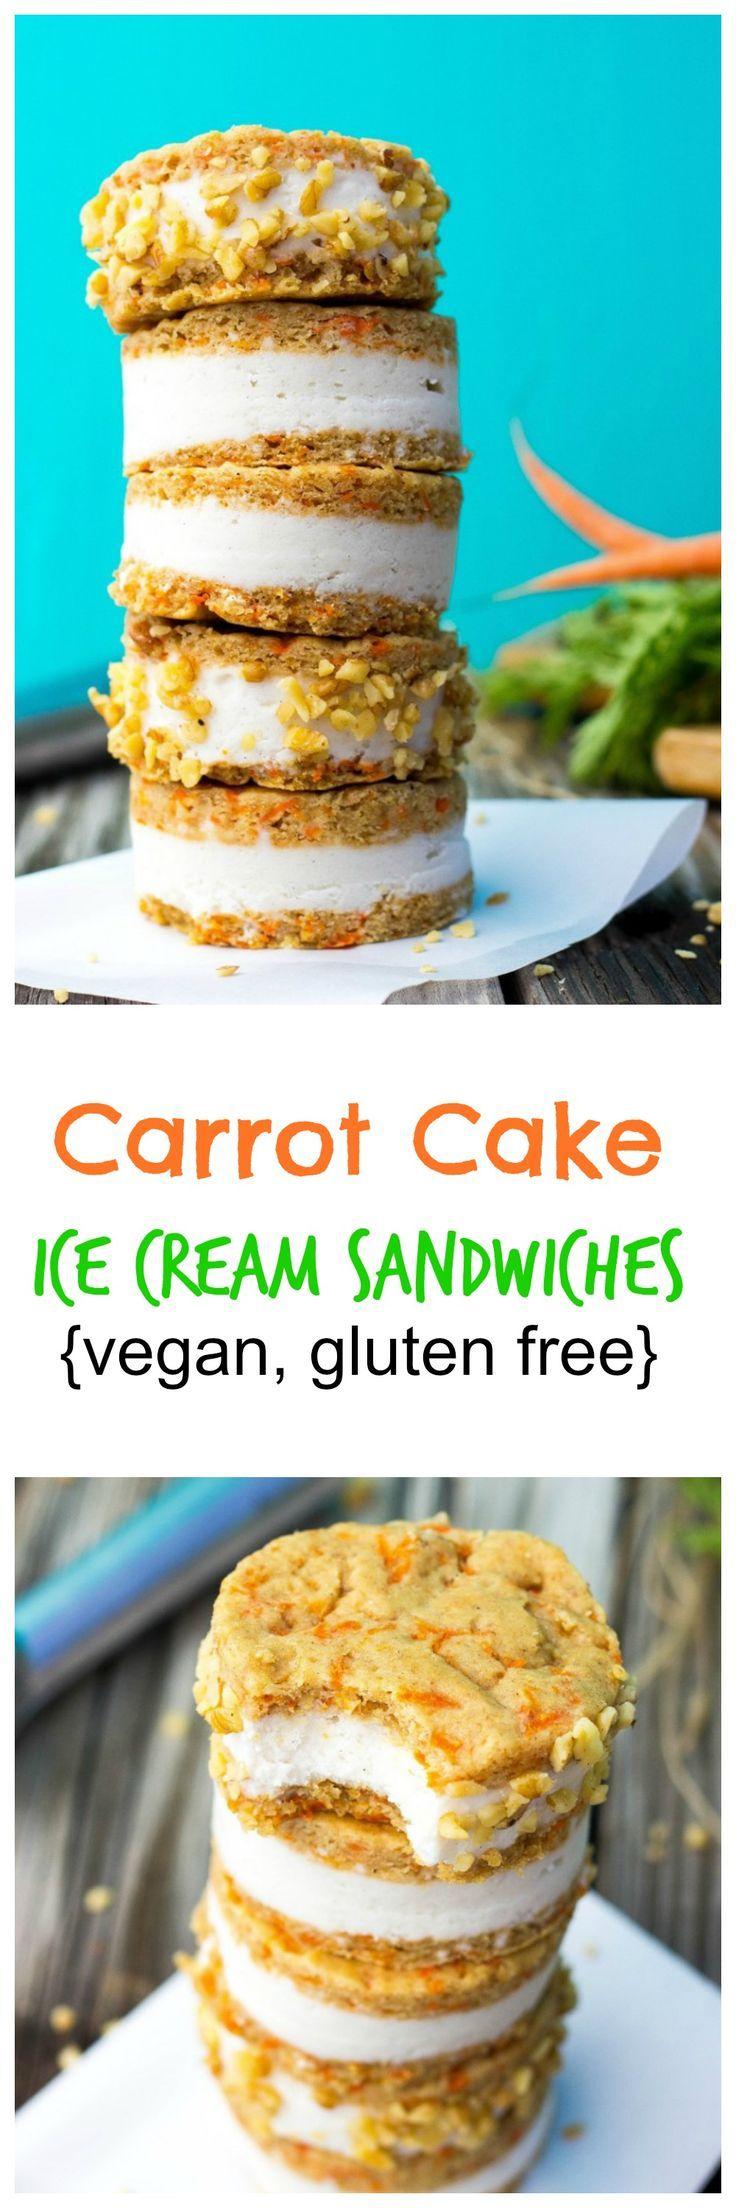 25+ best ideas about Icecream sandwich cake on Pinterest ...